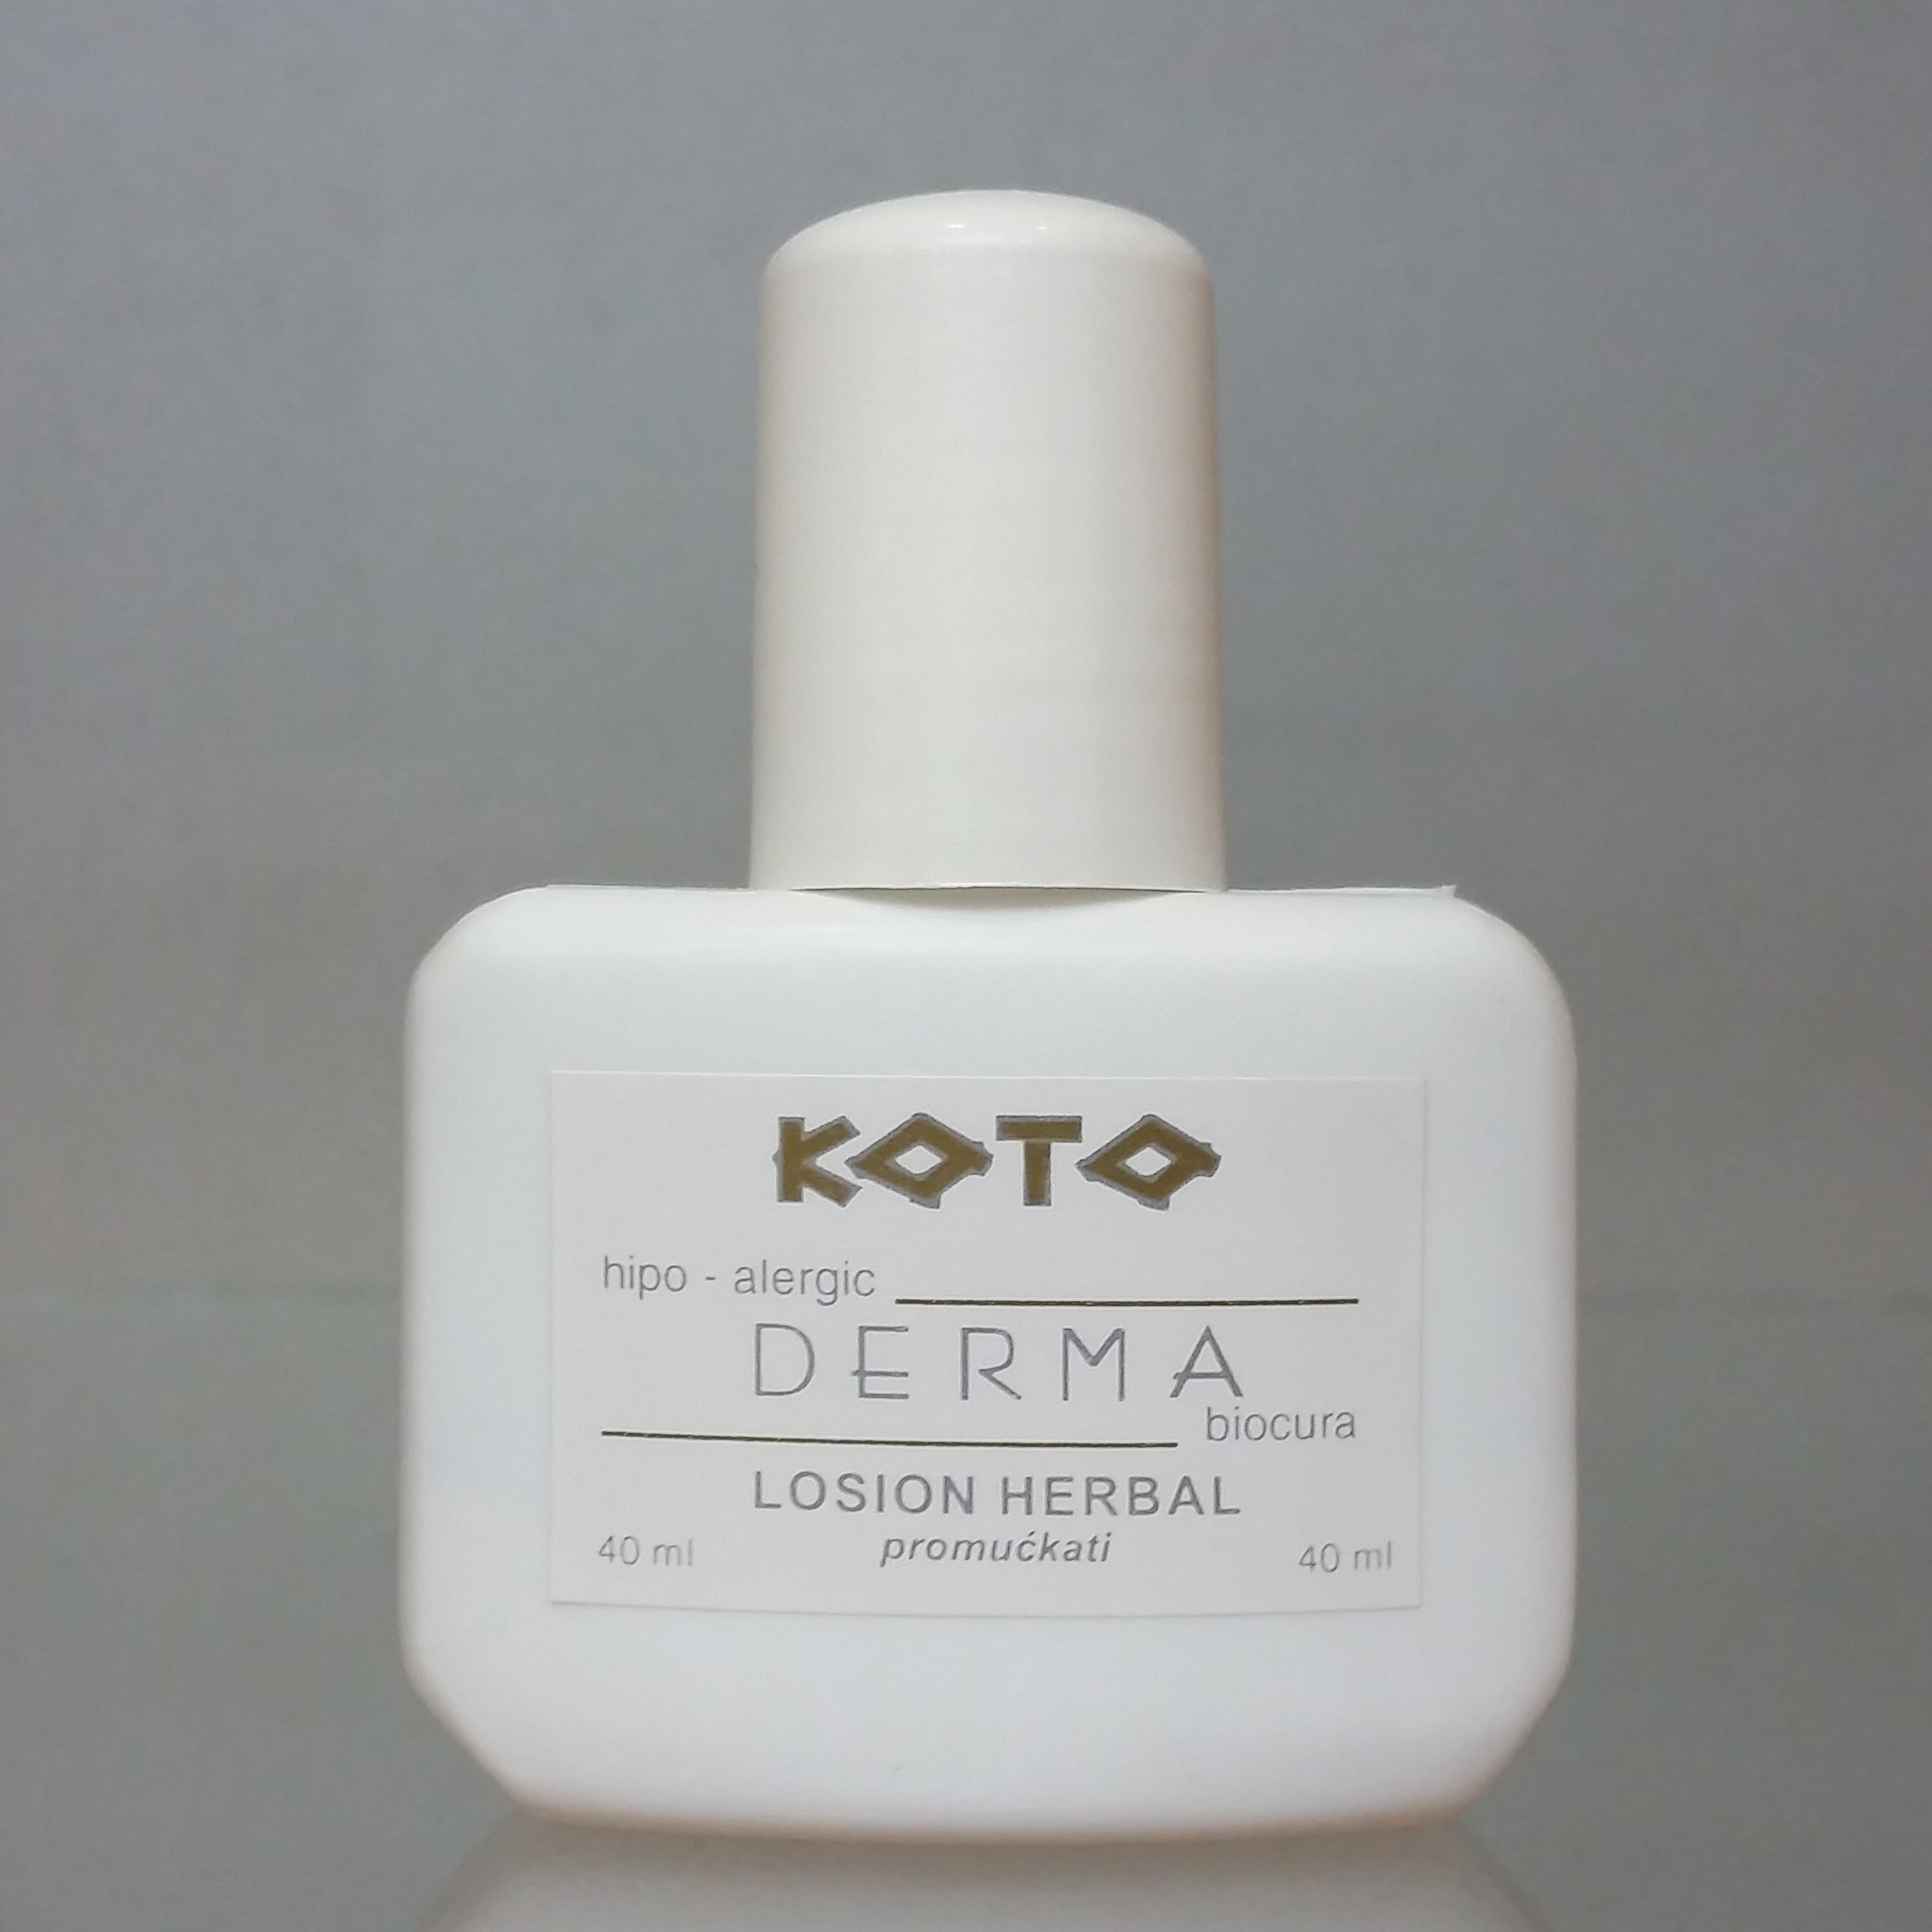 Losion herbal